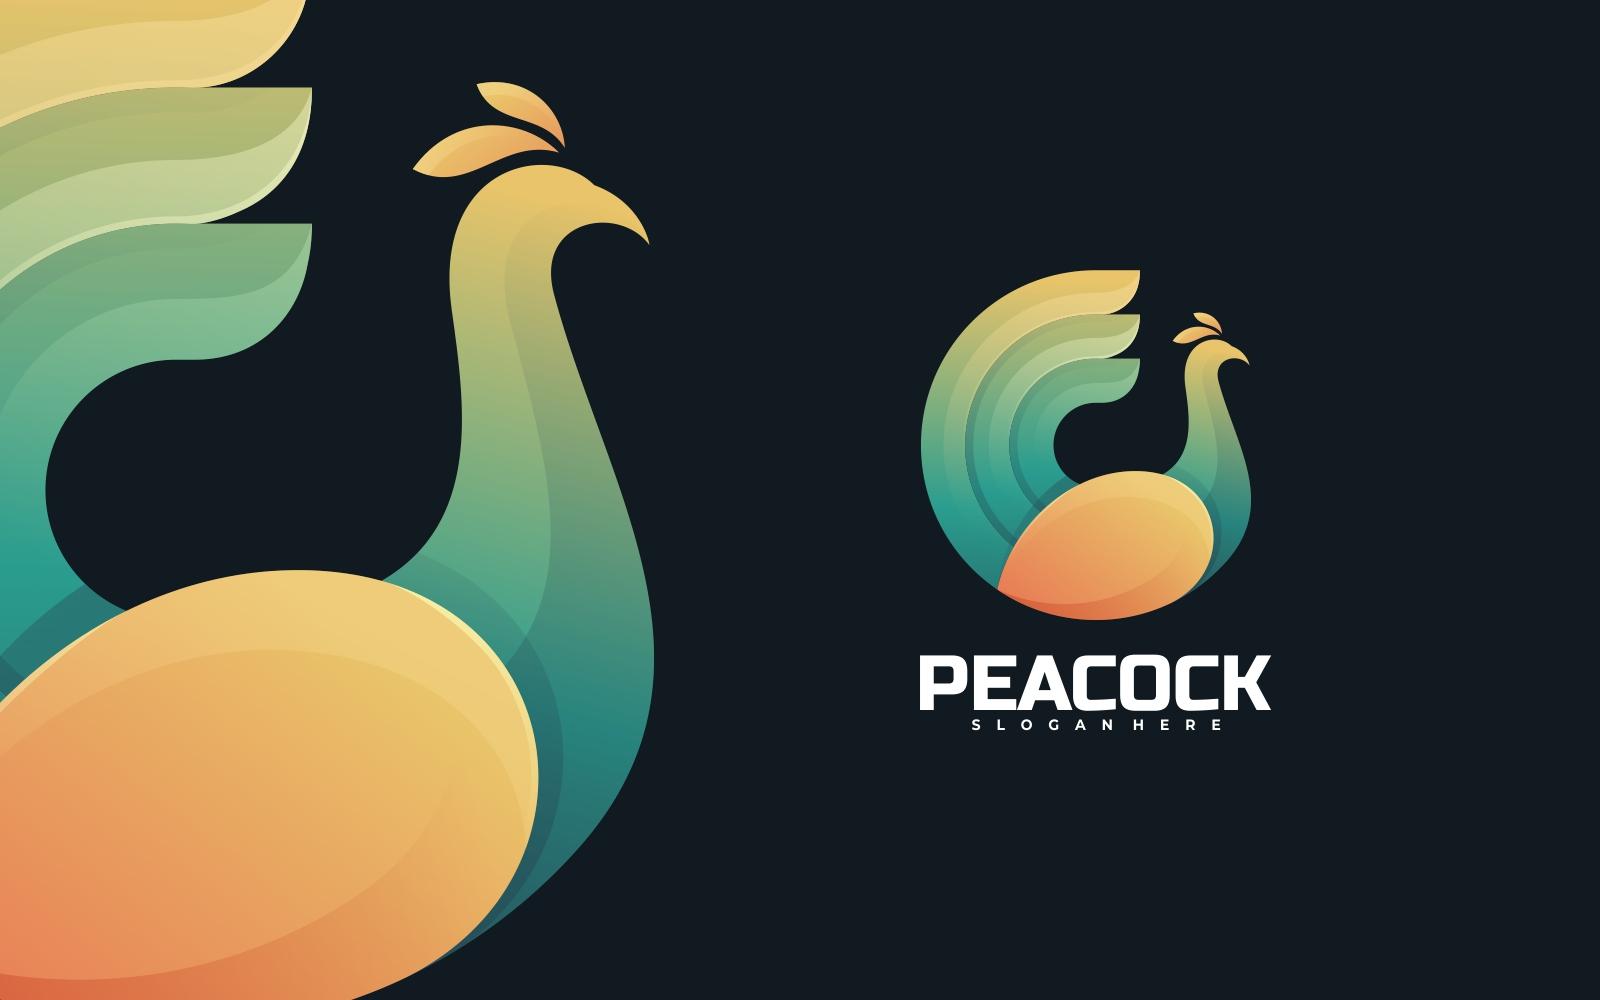 Peacock 3D Gradient Duotone Logo Template